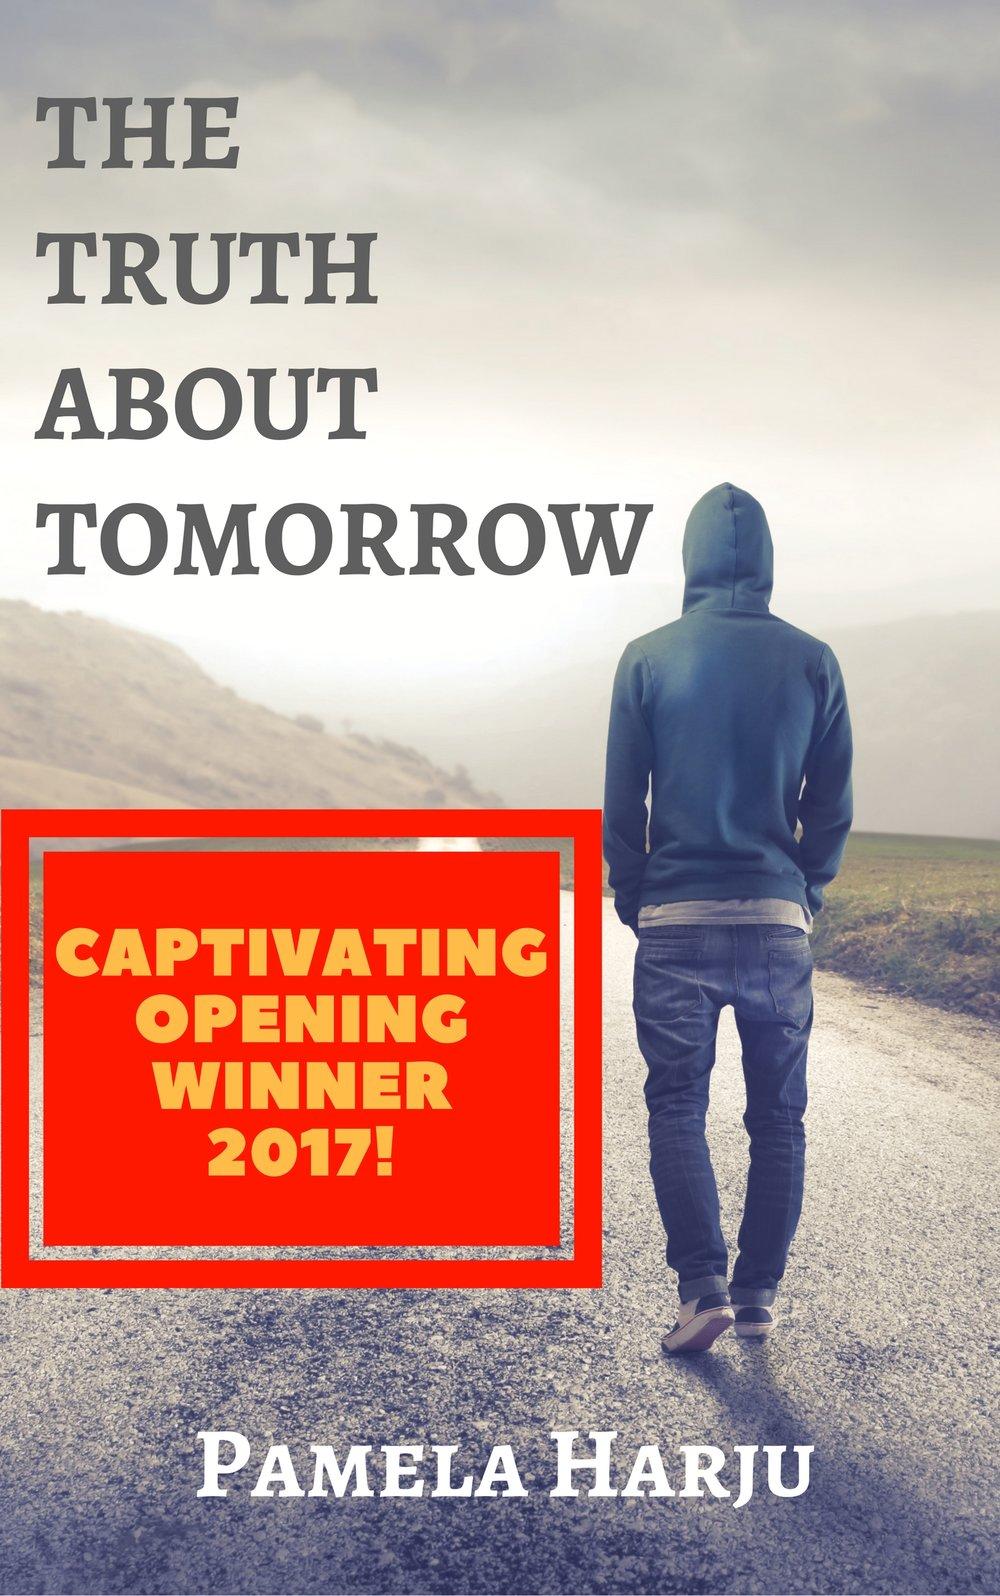 Captivating Opening Winner 2017.jpg